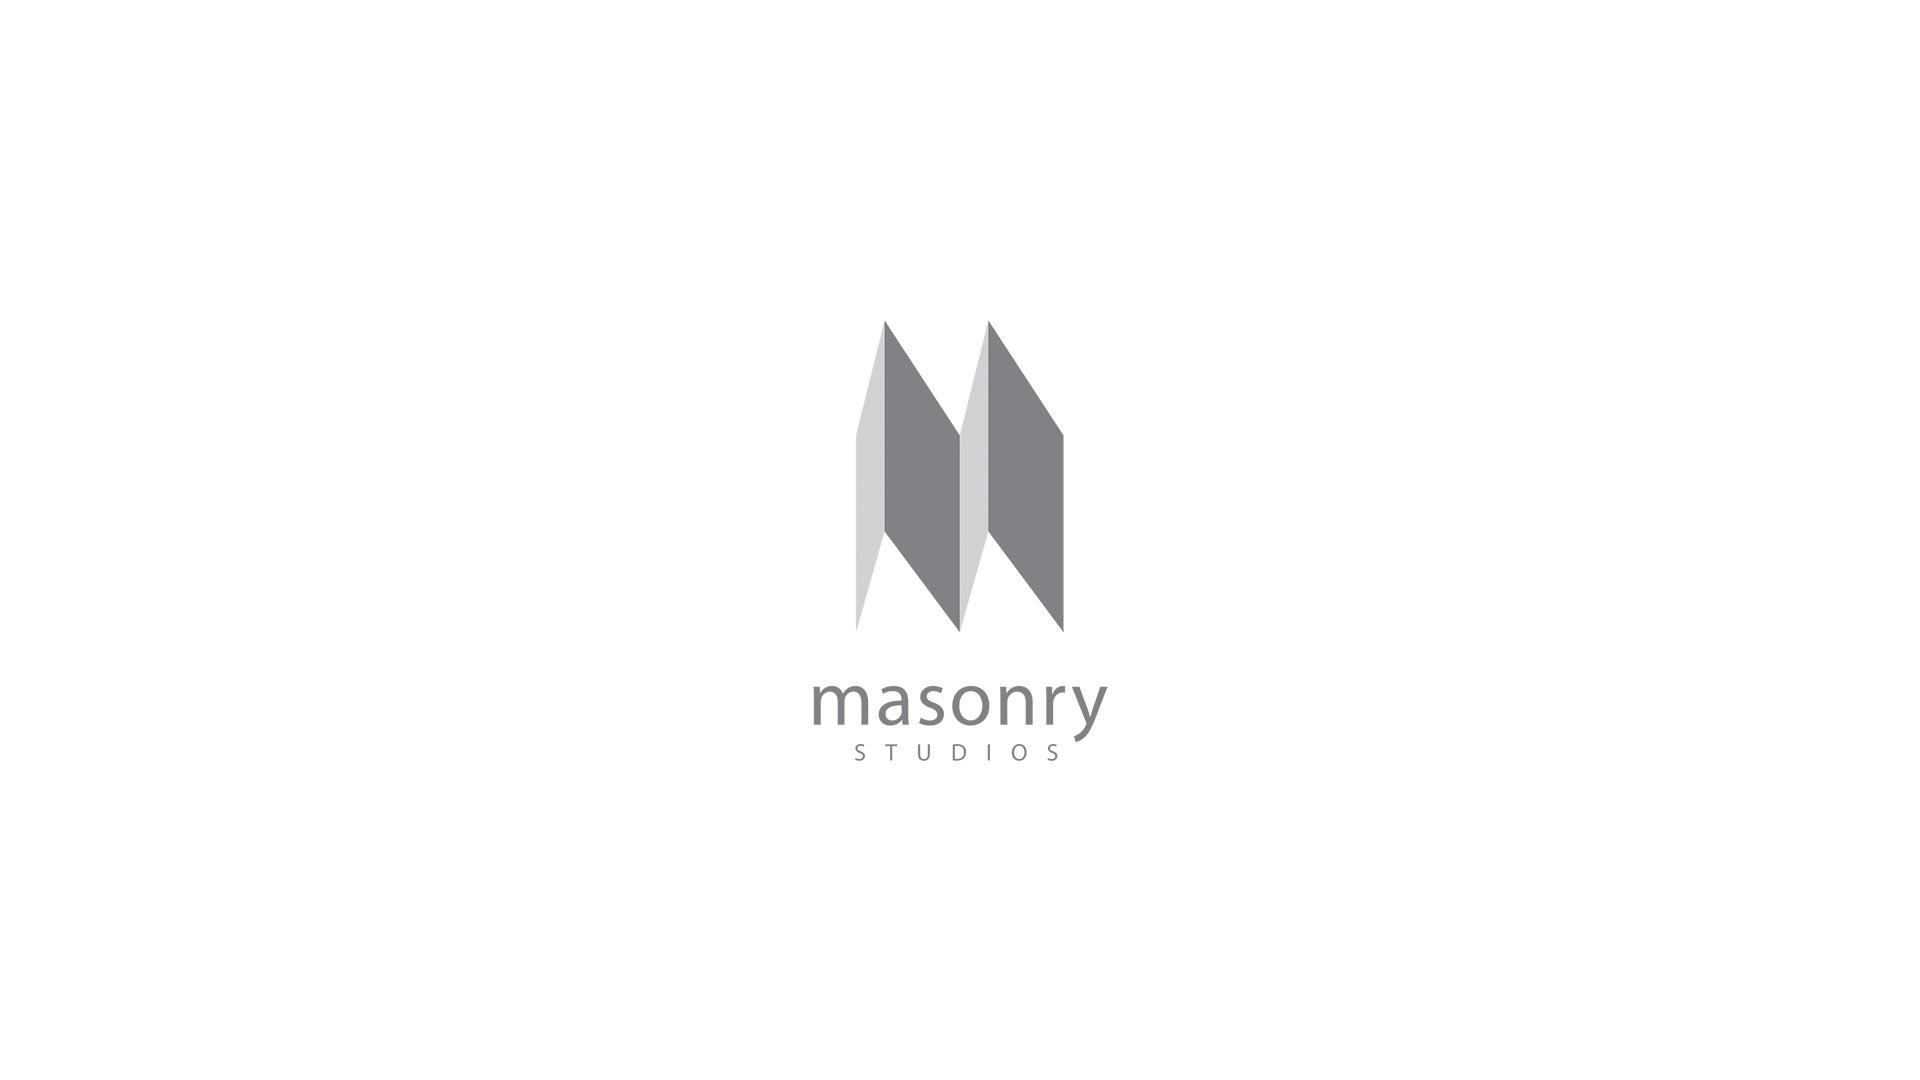 Masonry Studios Logo